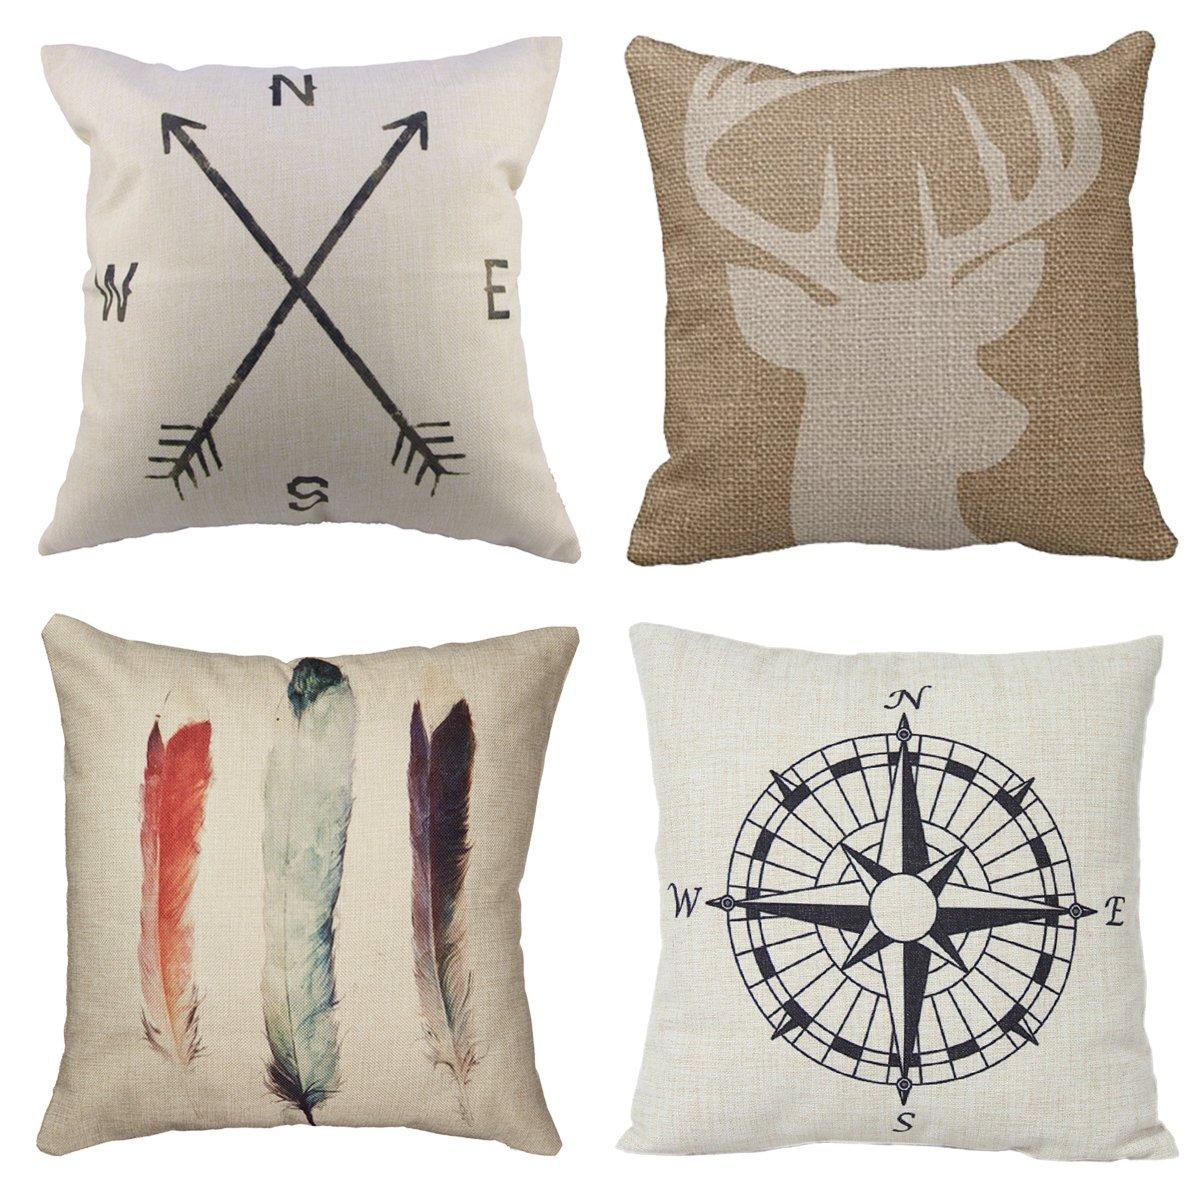 4 Packs Hippih Cotton Linen Sofa Home Decor Design Throw Pillow Case Cushion Covers 18 X 18 Inch ,1x Deer Antlers + 1x Feathers + 1x Compass + 1x Navigation Compass